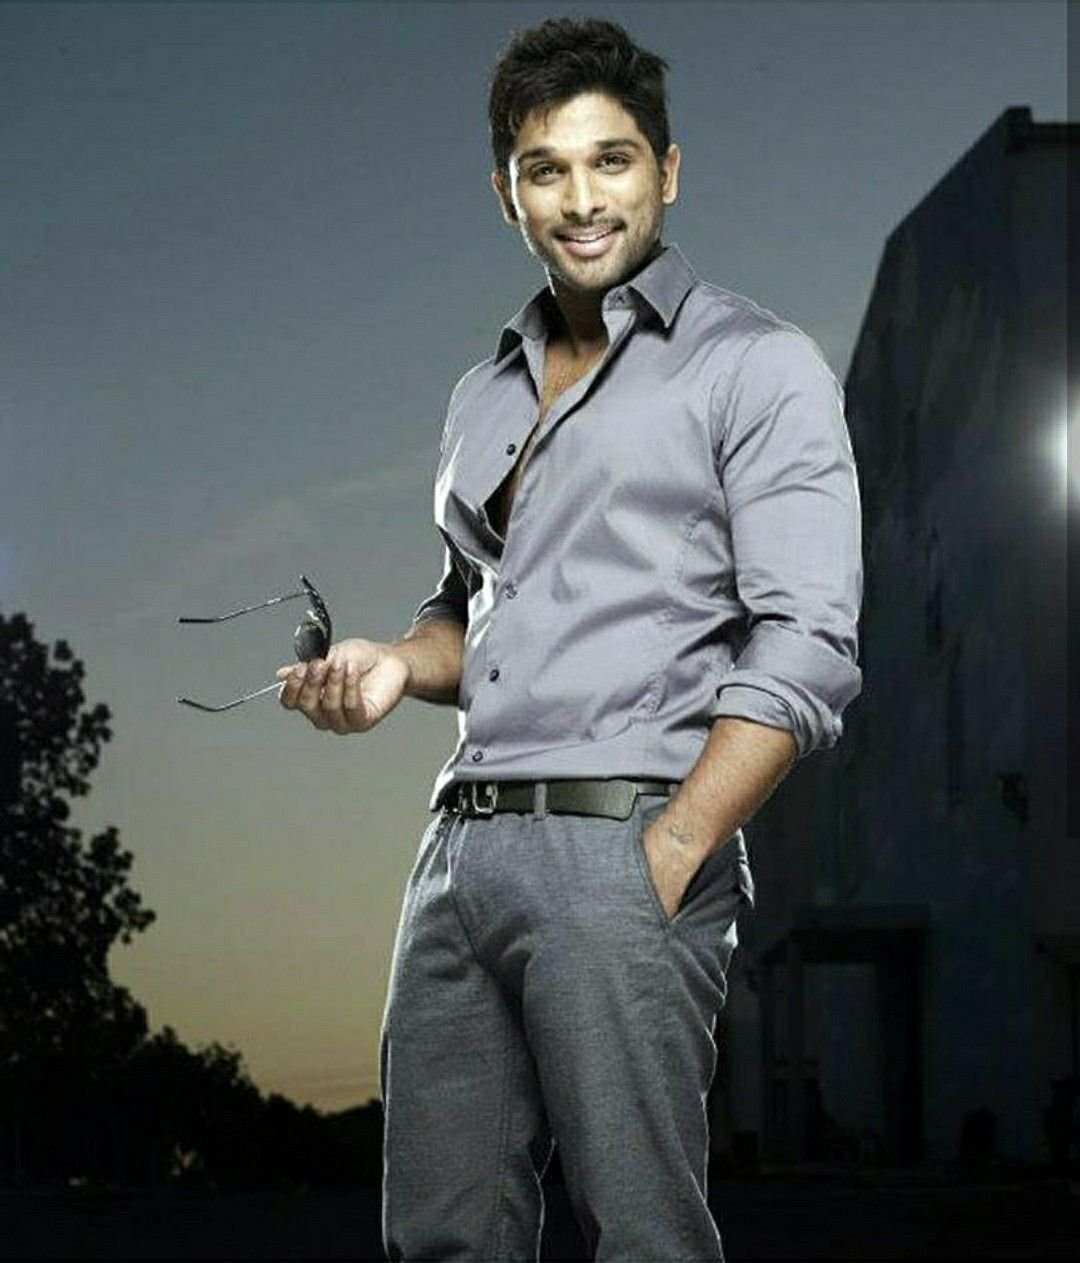 Allu Arjun (With images) | Hd photos, Photo, Actors images